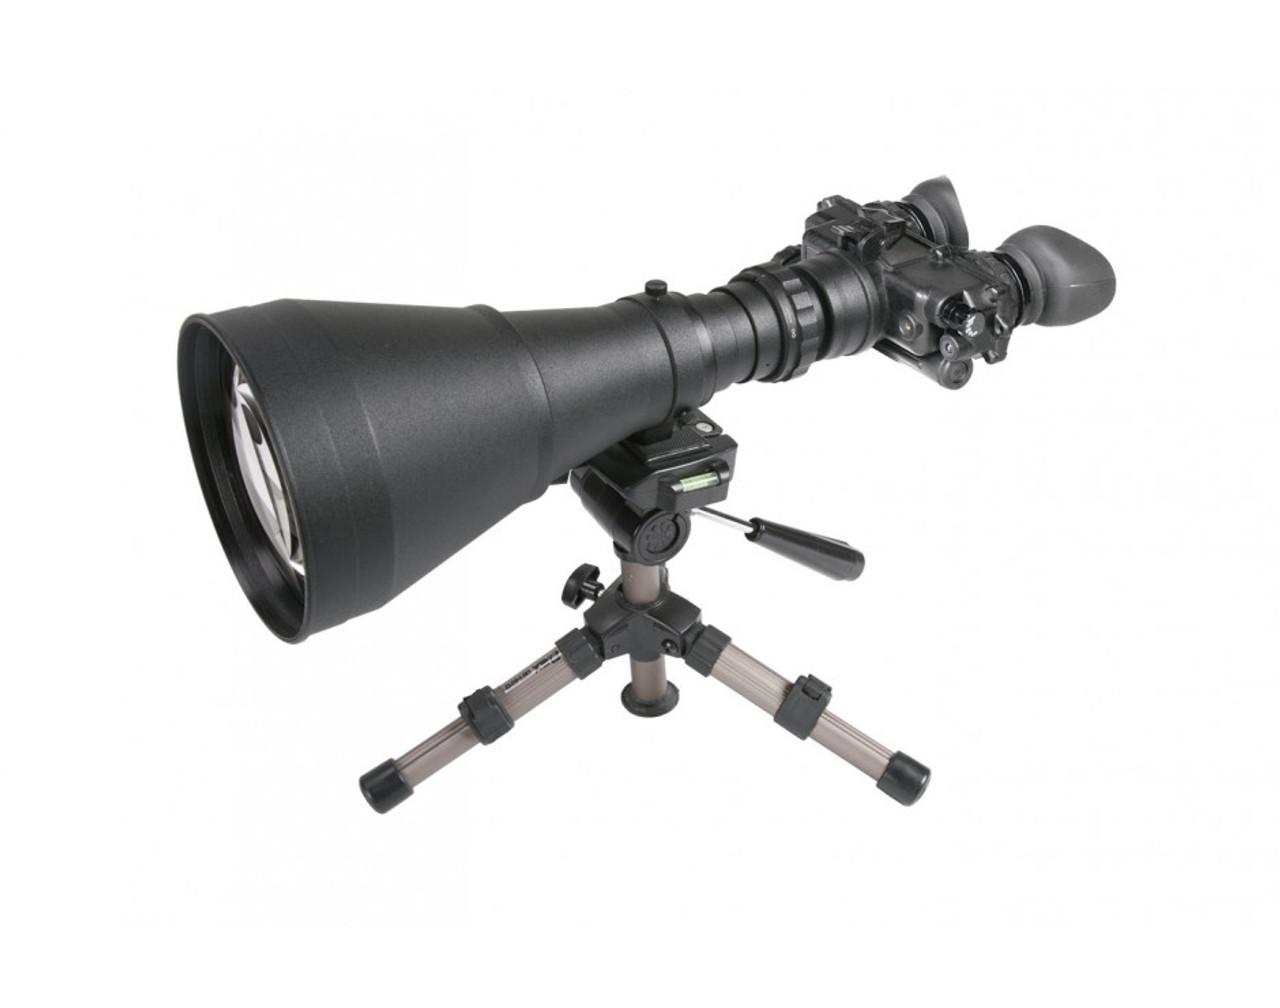 "AGM FoxBat-LE10 3NL1 Night Vision Bi-Ocular 9.6x Gen 3 ""Level 1"" with Sioux850 Long-Range Infrared Illuminator. Made in USA! ( AGM FOXBAT-LE10 3NL1)"